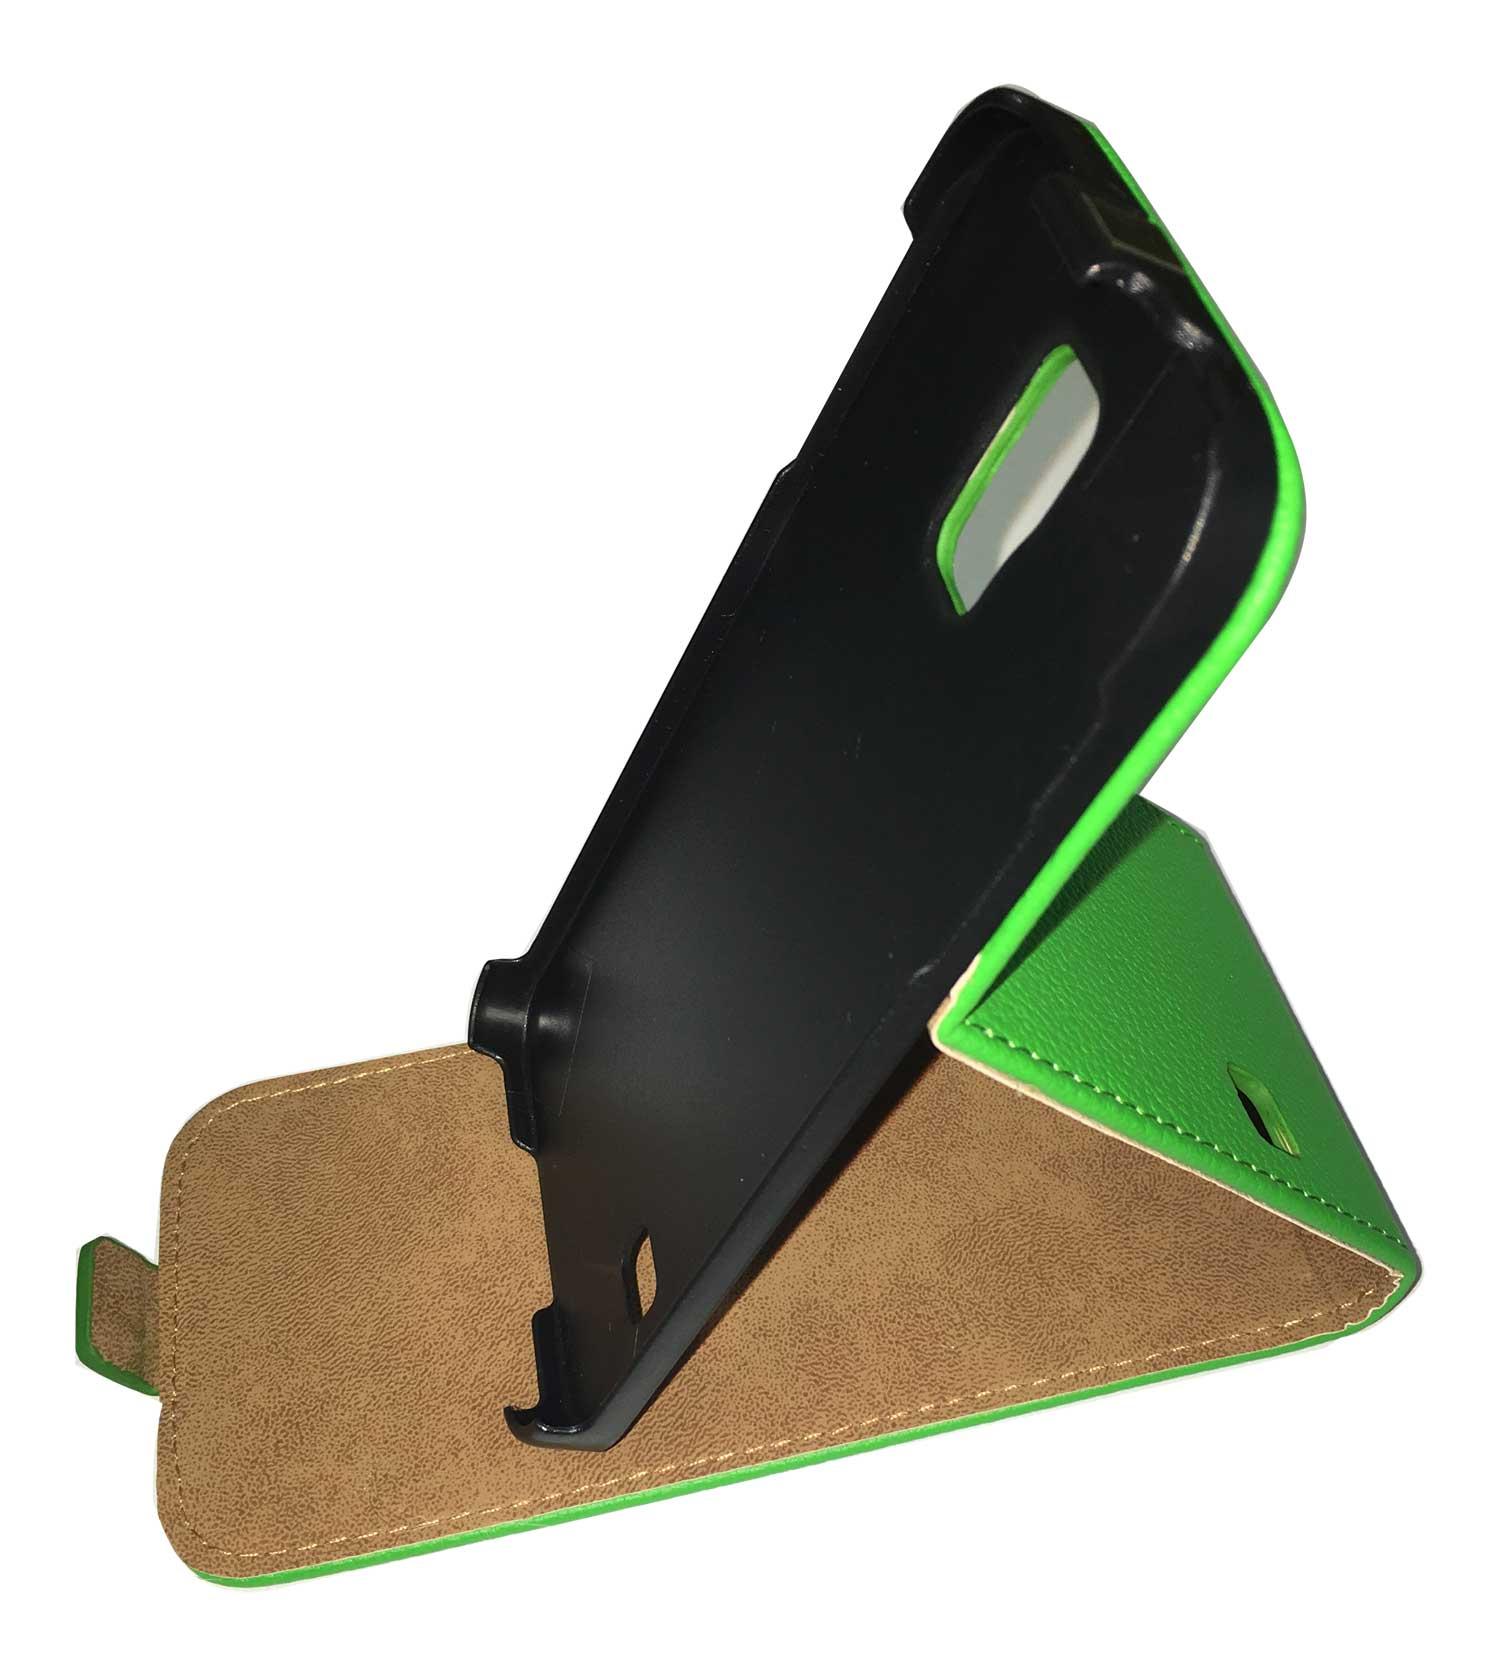 flip-verde-in-piedi